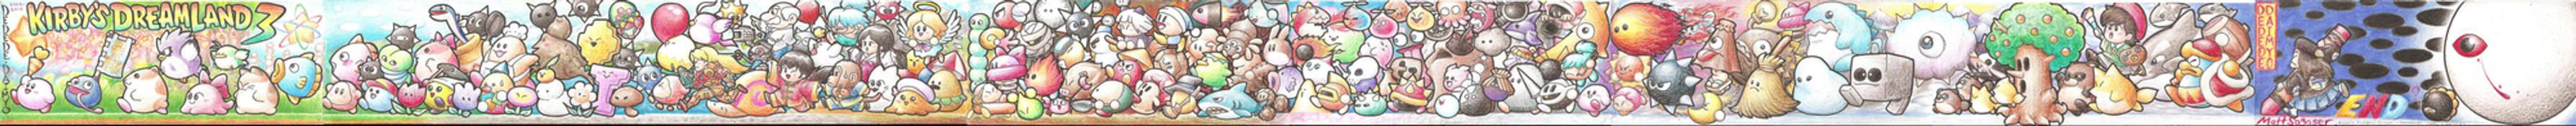 Kirby's Dream Land 3 Emaki